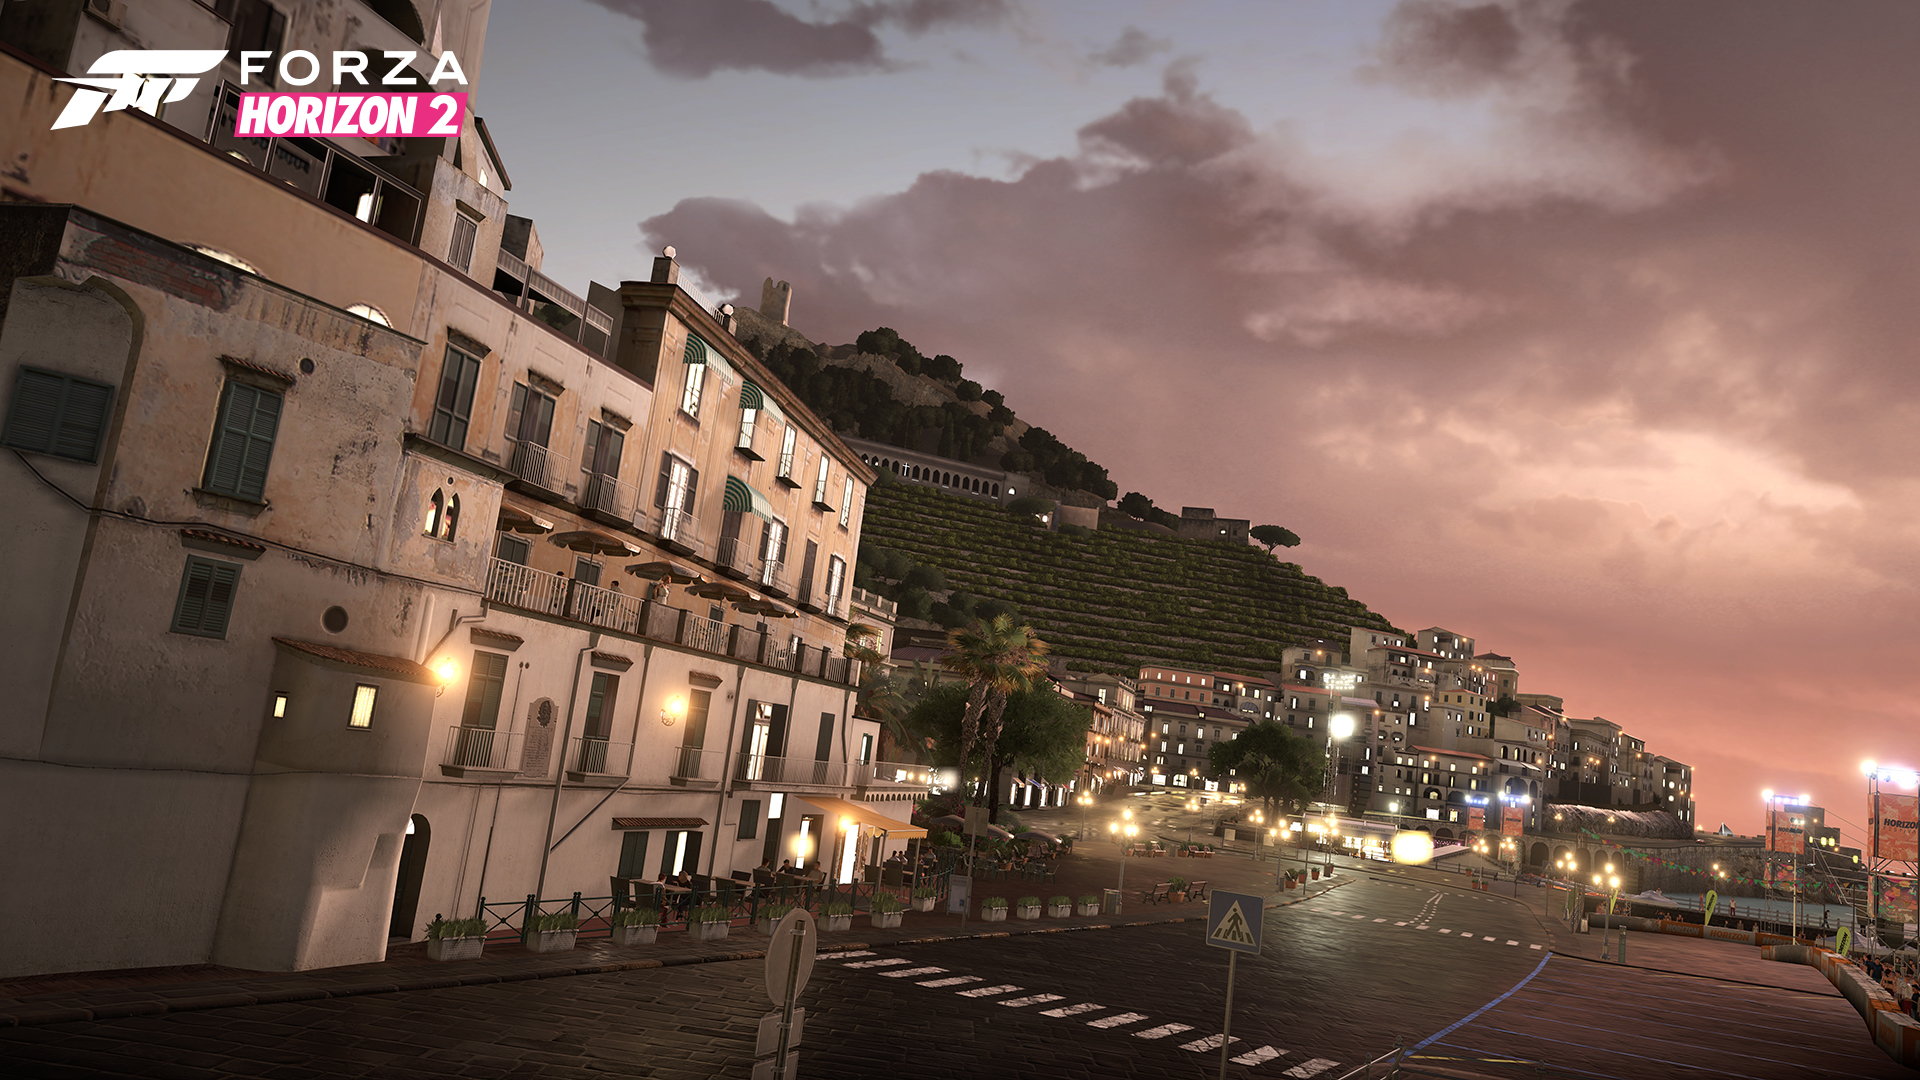 Forza-Horizon-2-Screenshots-1